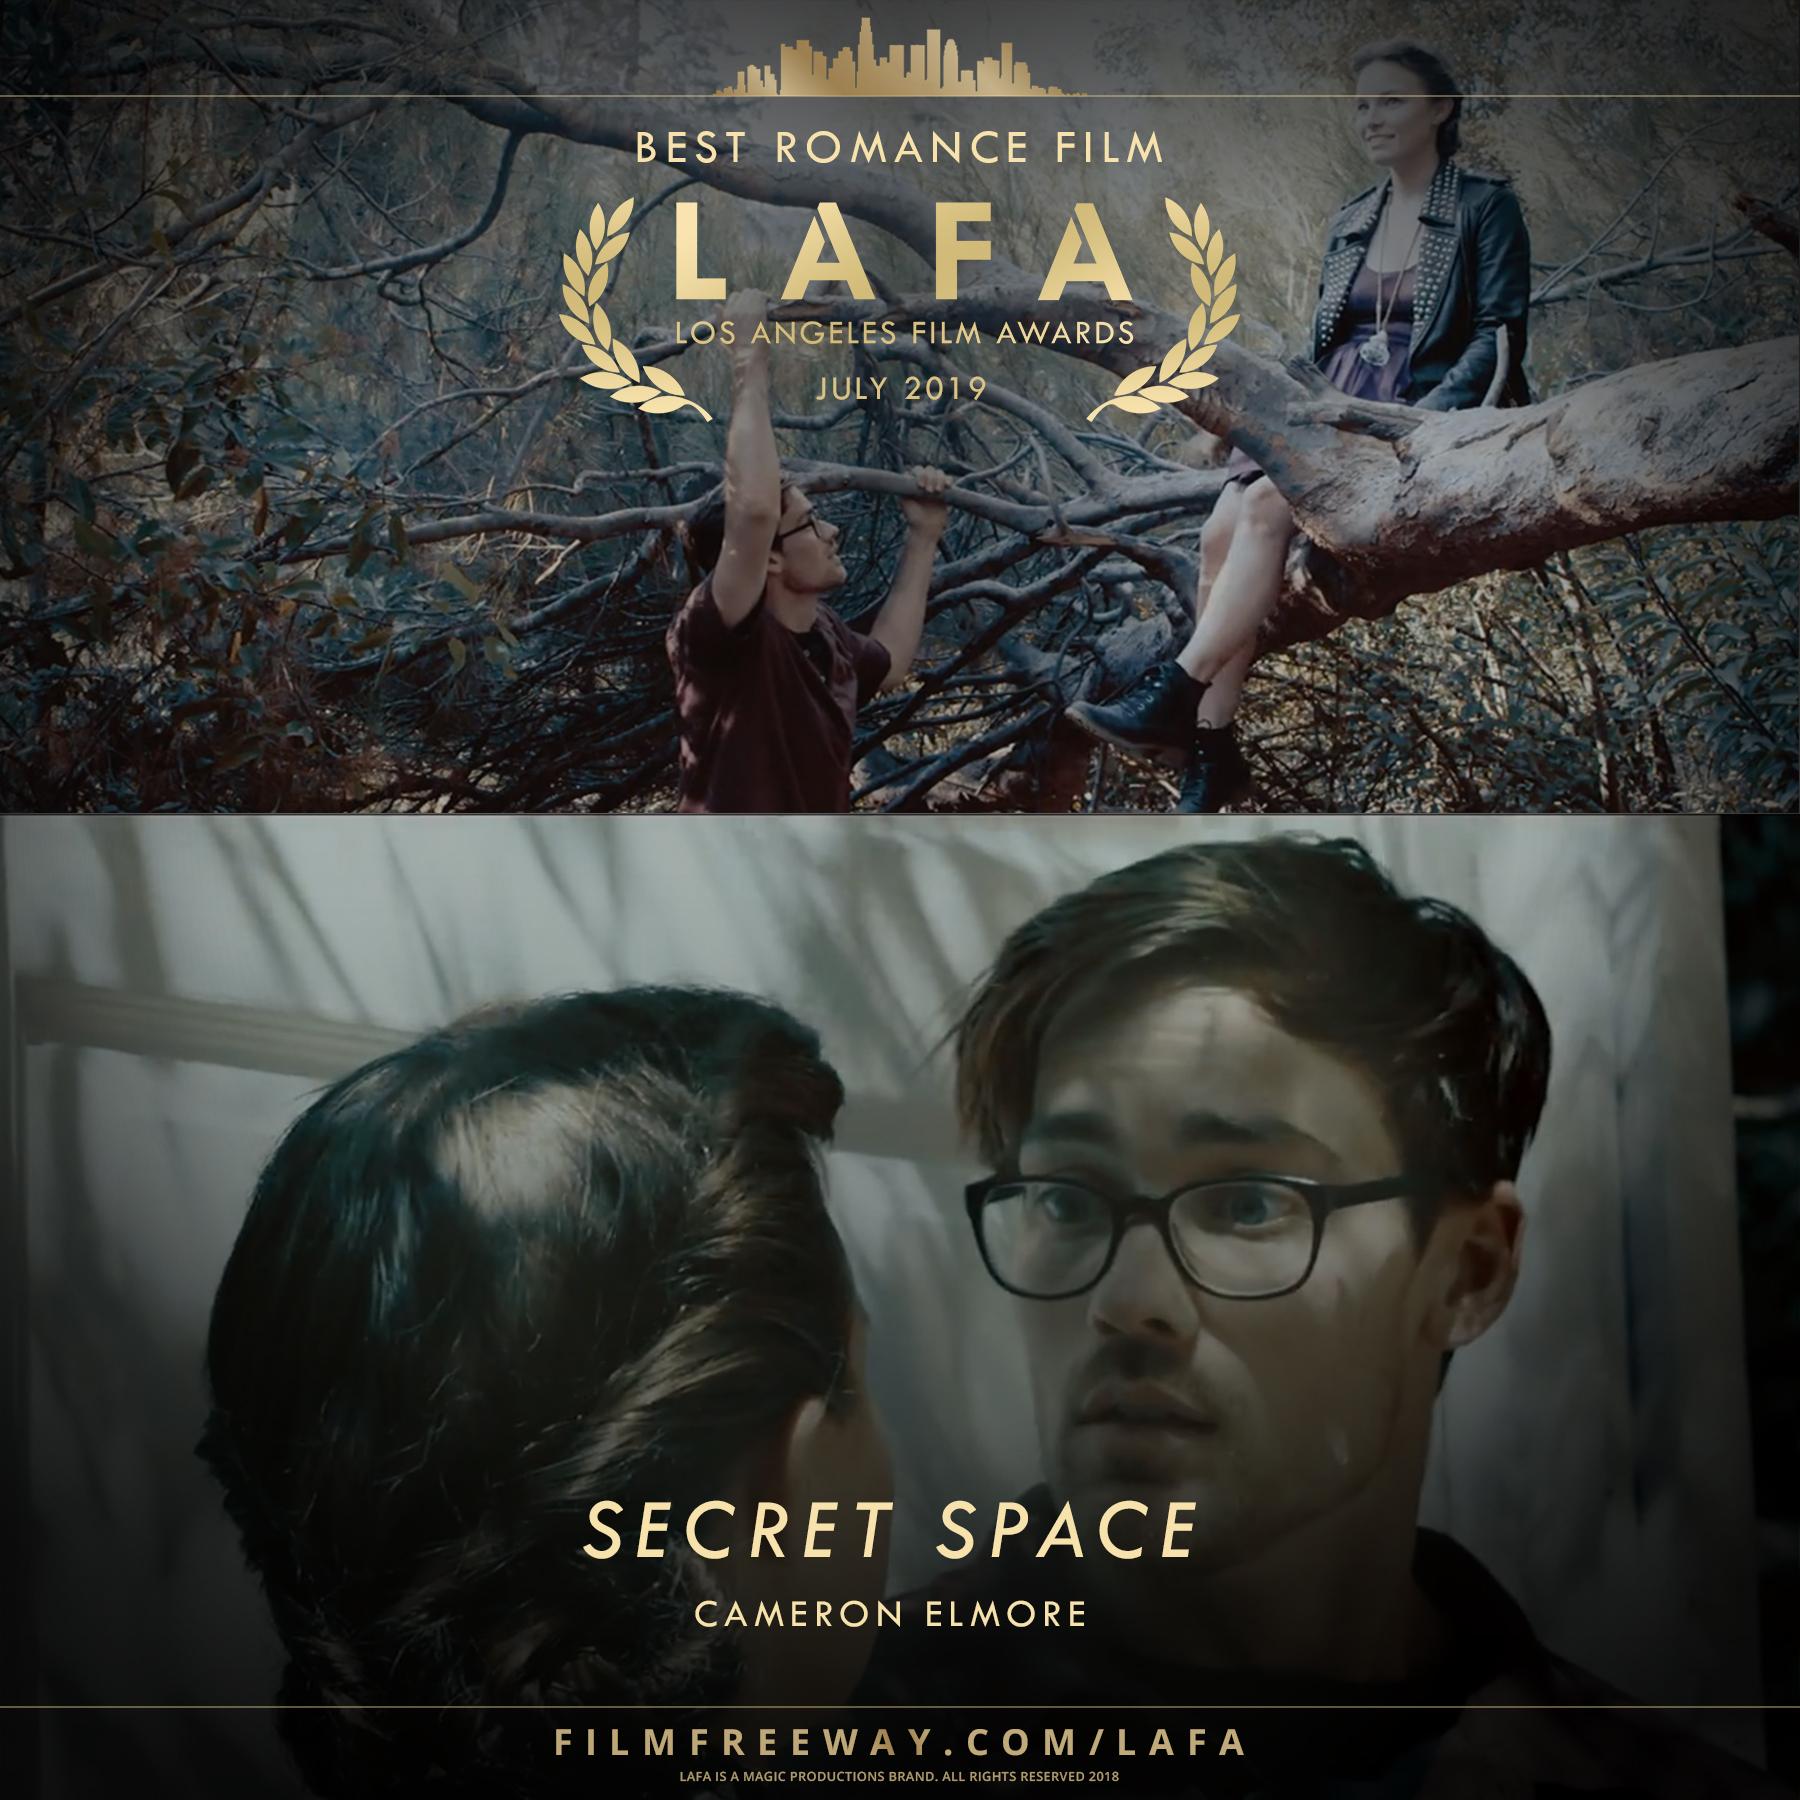 SECRET SPACE design